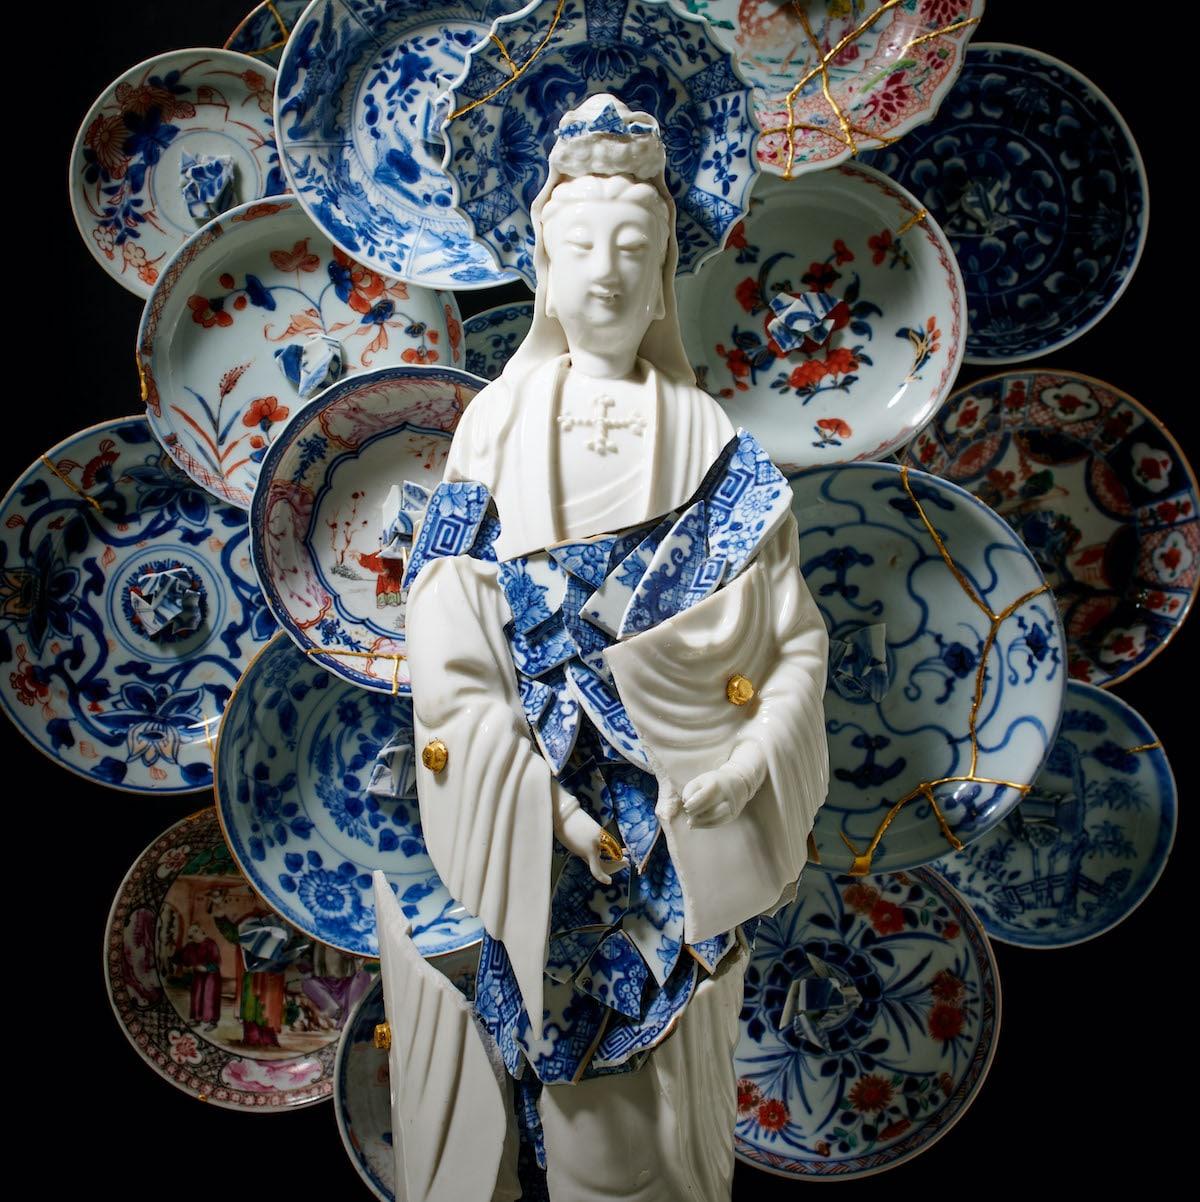 Bouke de Vries Guan Yin With a Nimbus of Saucers Porcelain Fragmented Sculpture